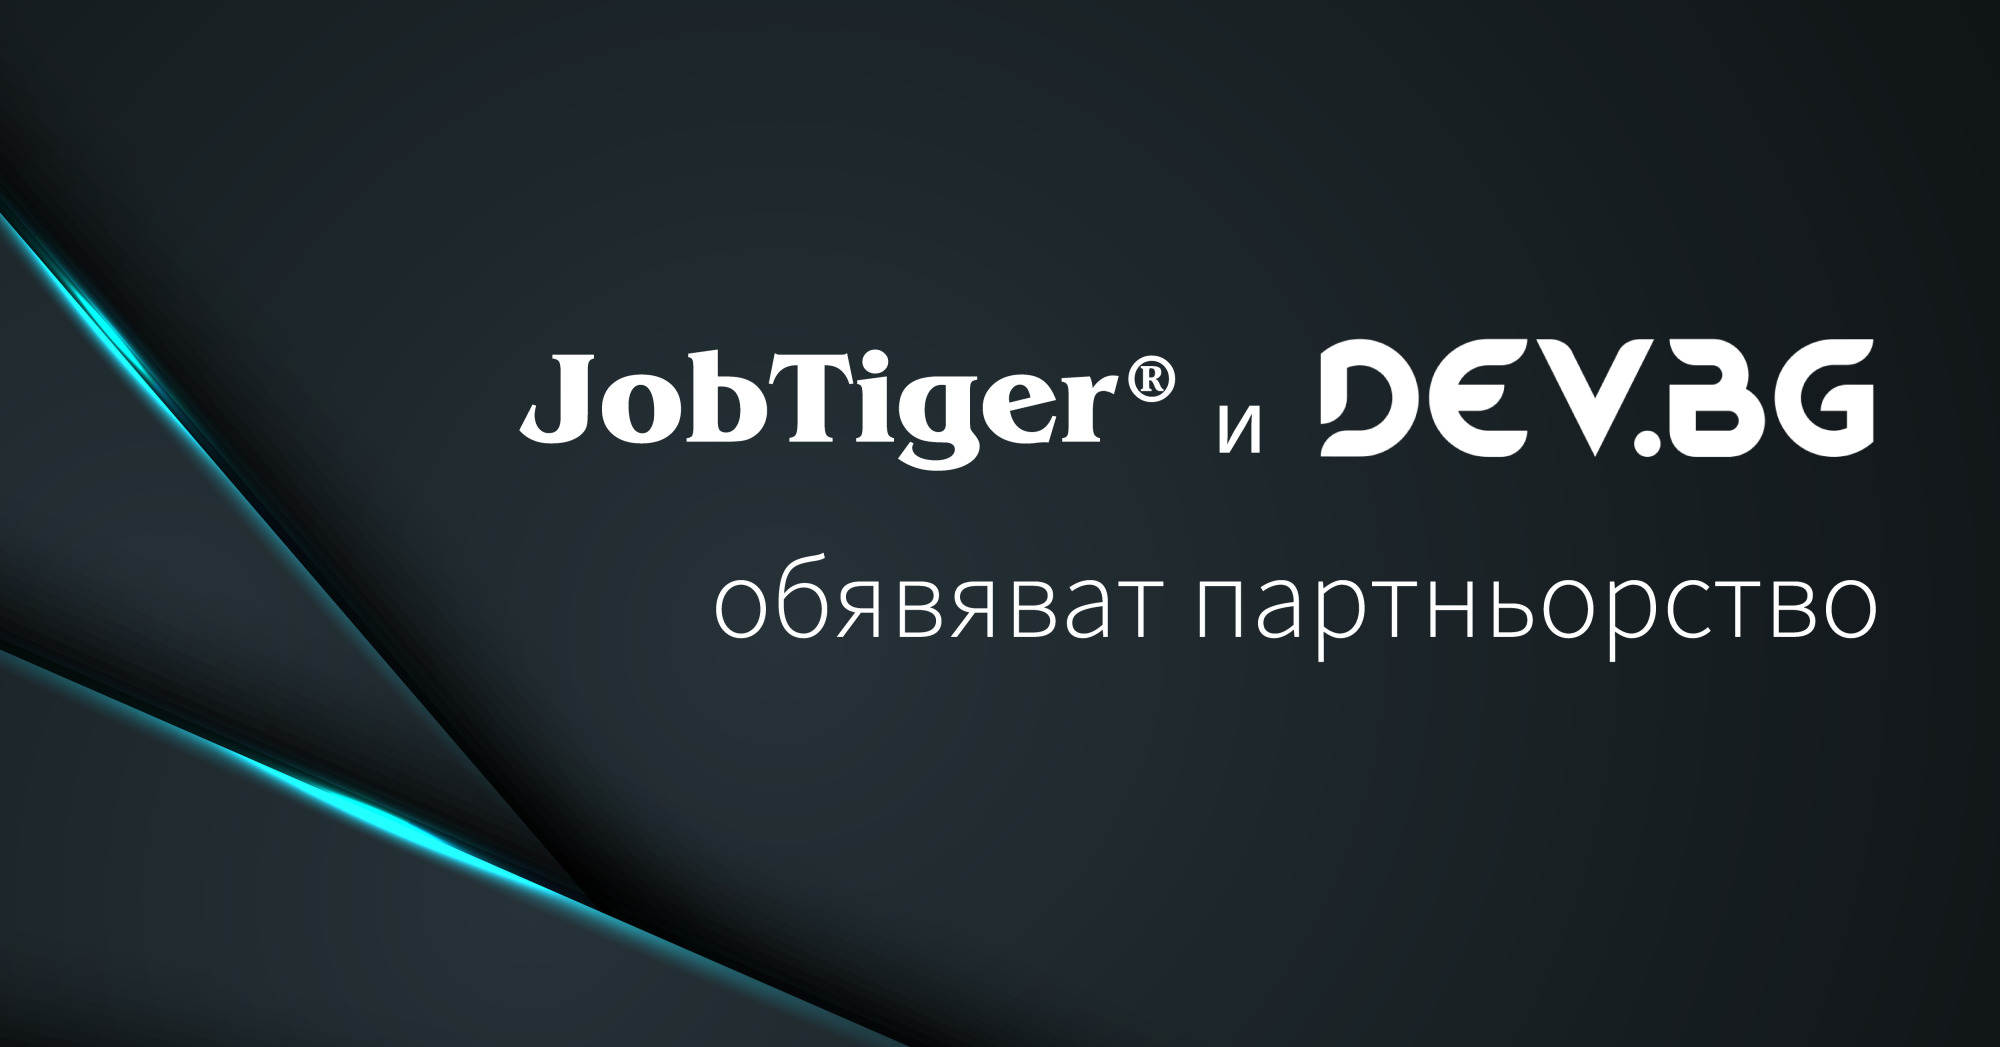 DEV.BG JobTiger 9Academy IT бизнес